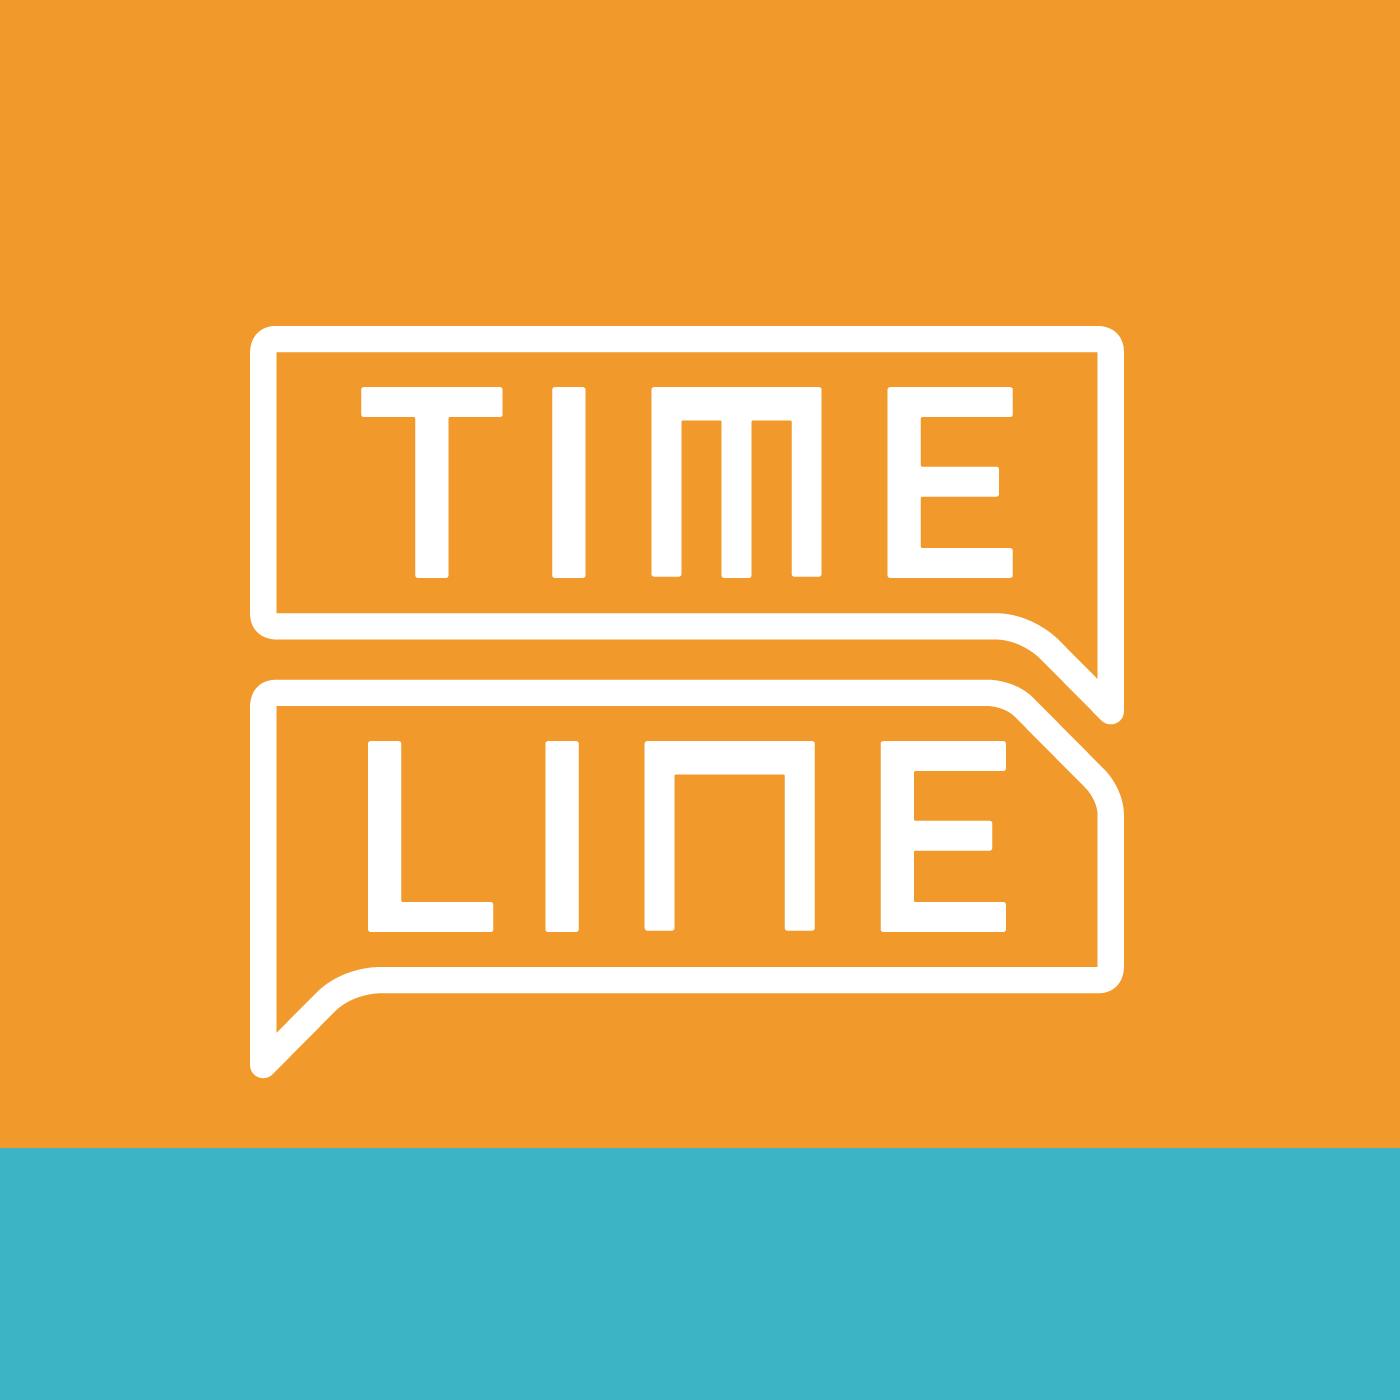 Timeline Gaúcha 20.03.2018